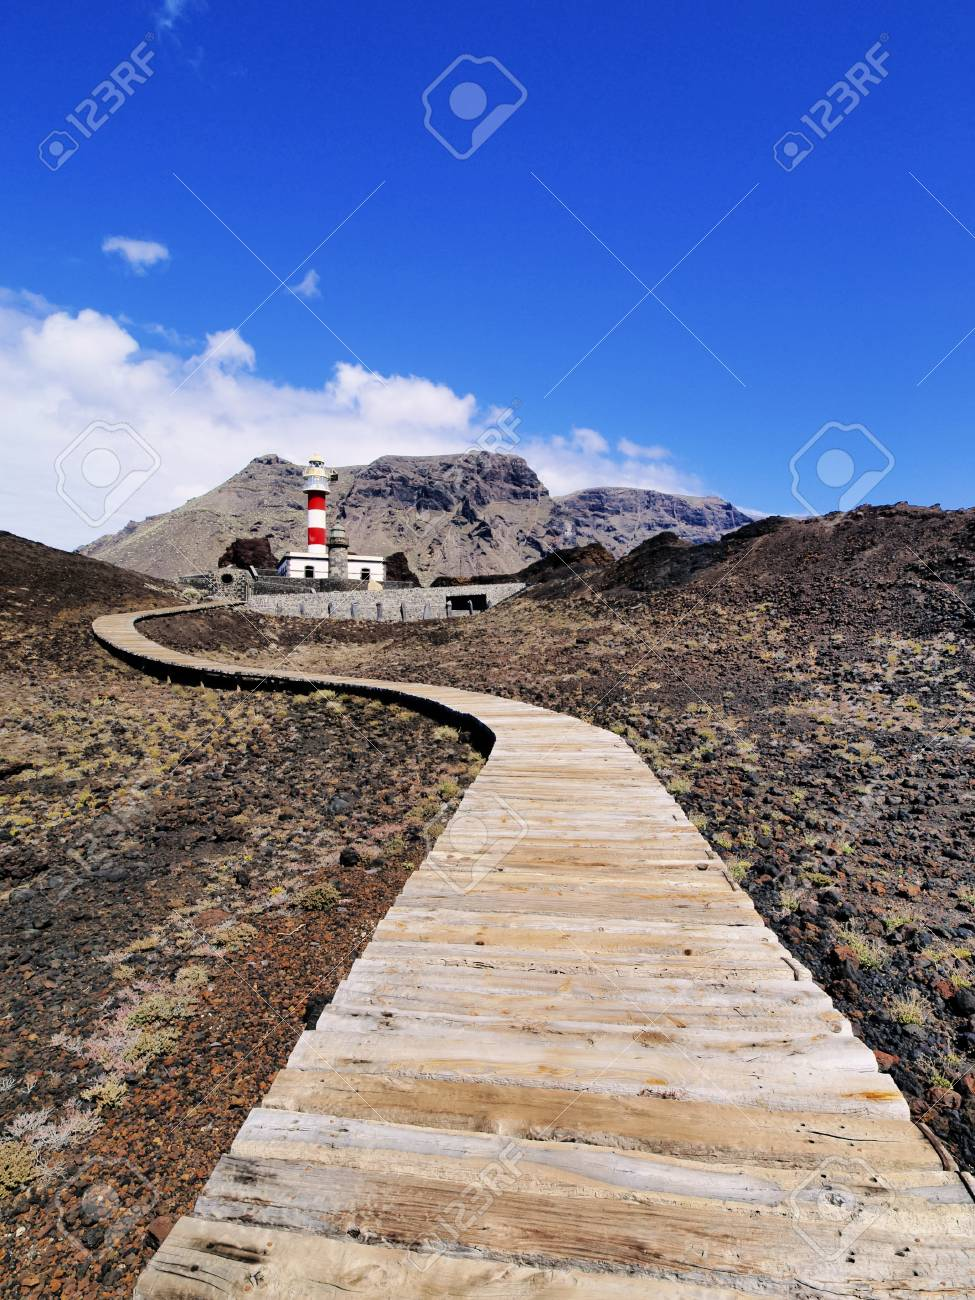 Lighthouse in Punta Teno, Tenerife, Canary Islands, Spain Stock Photo - 16582116